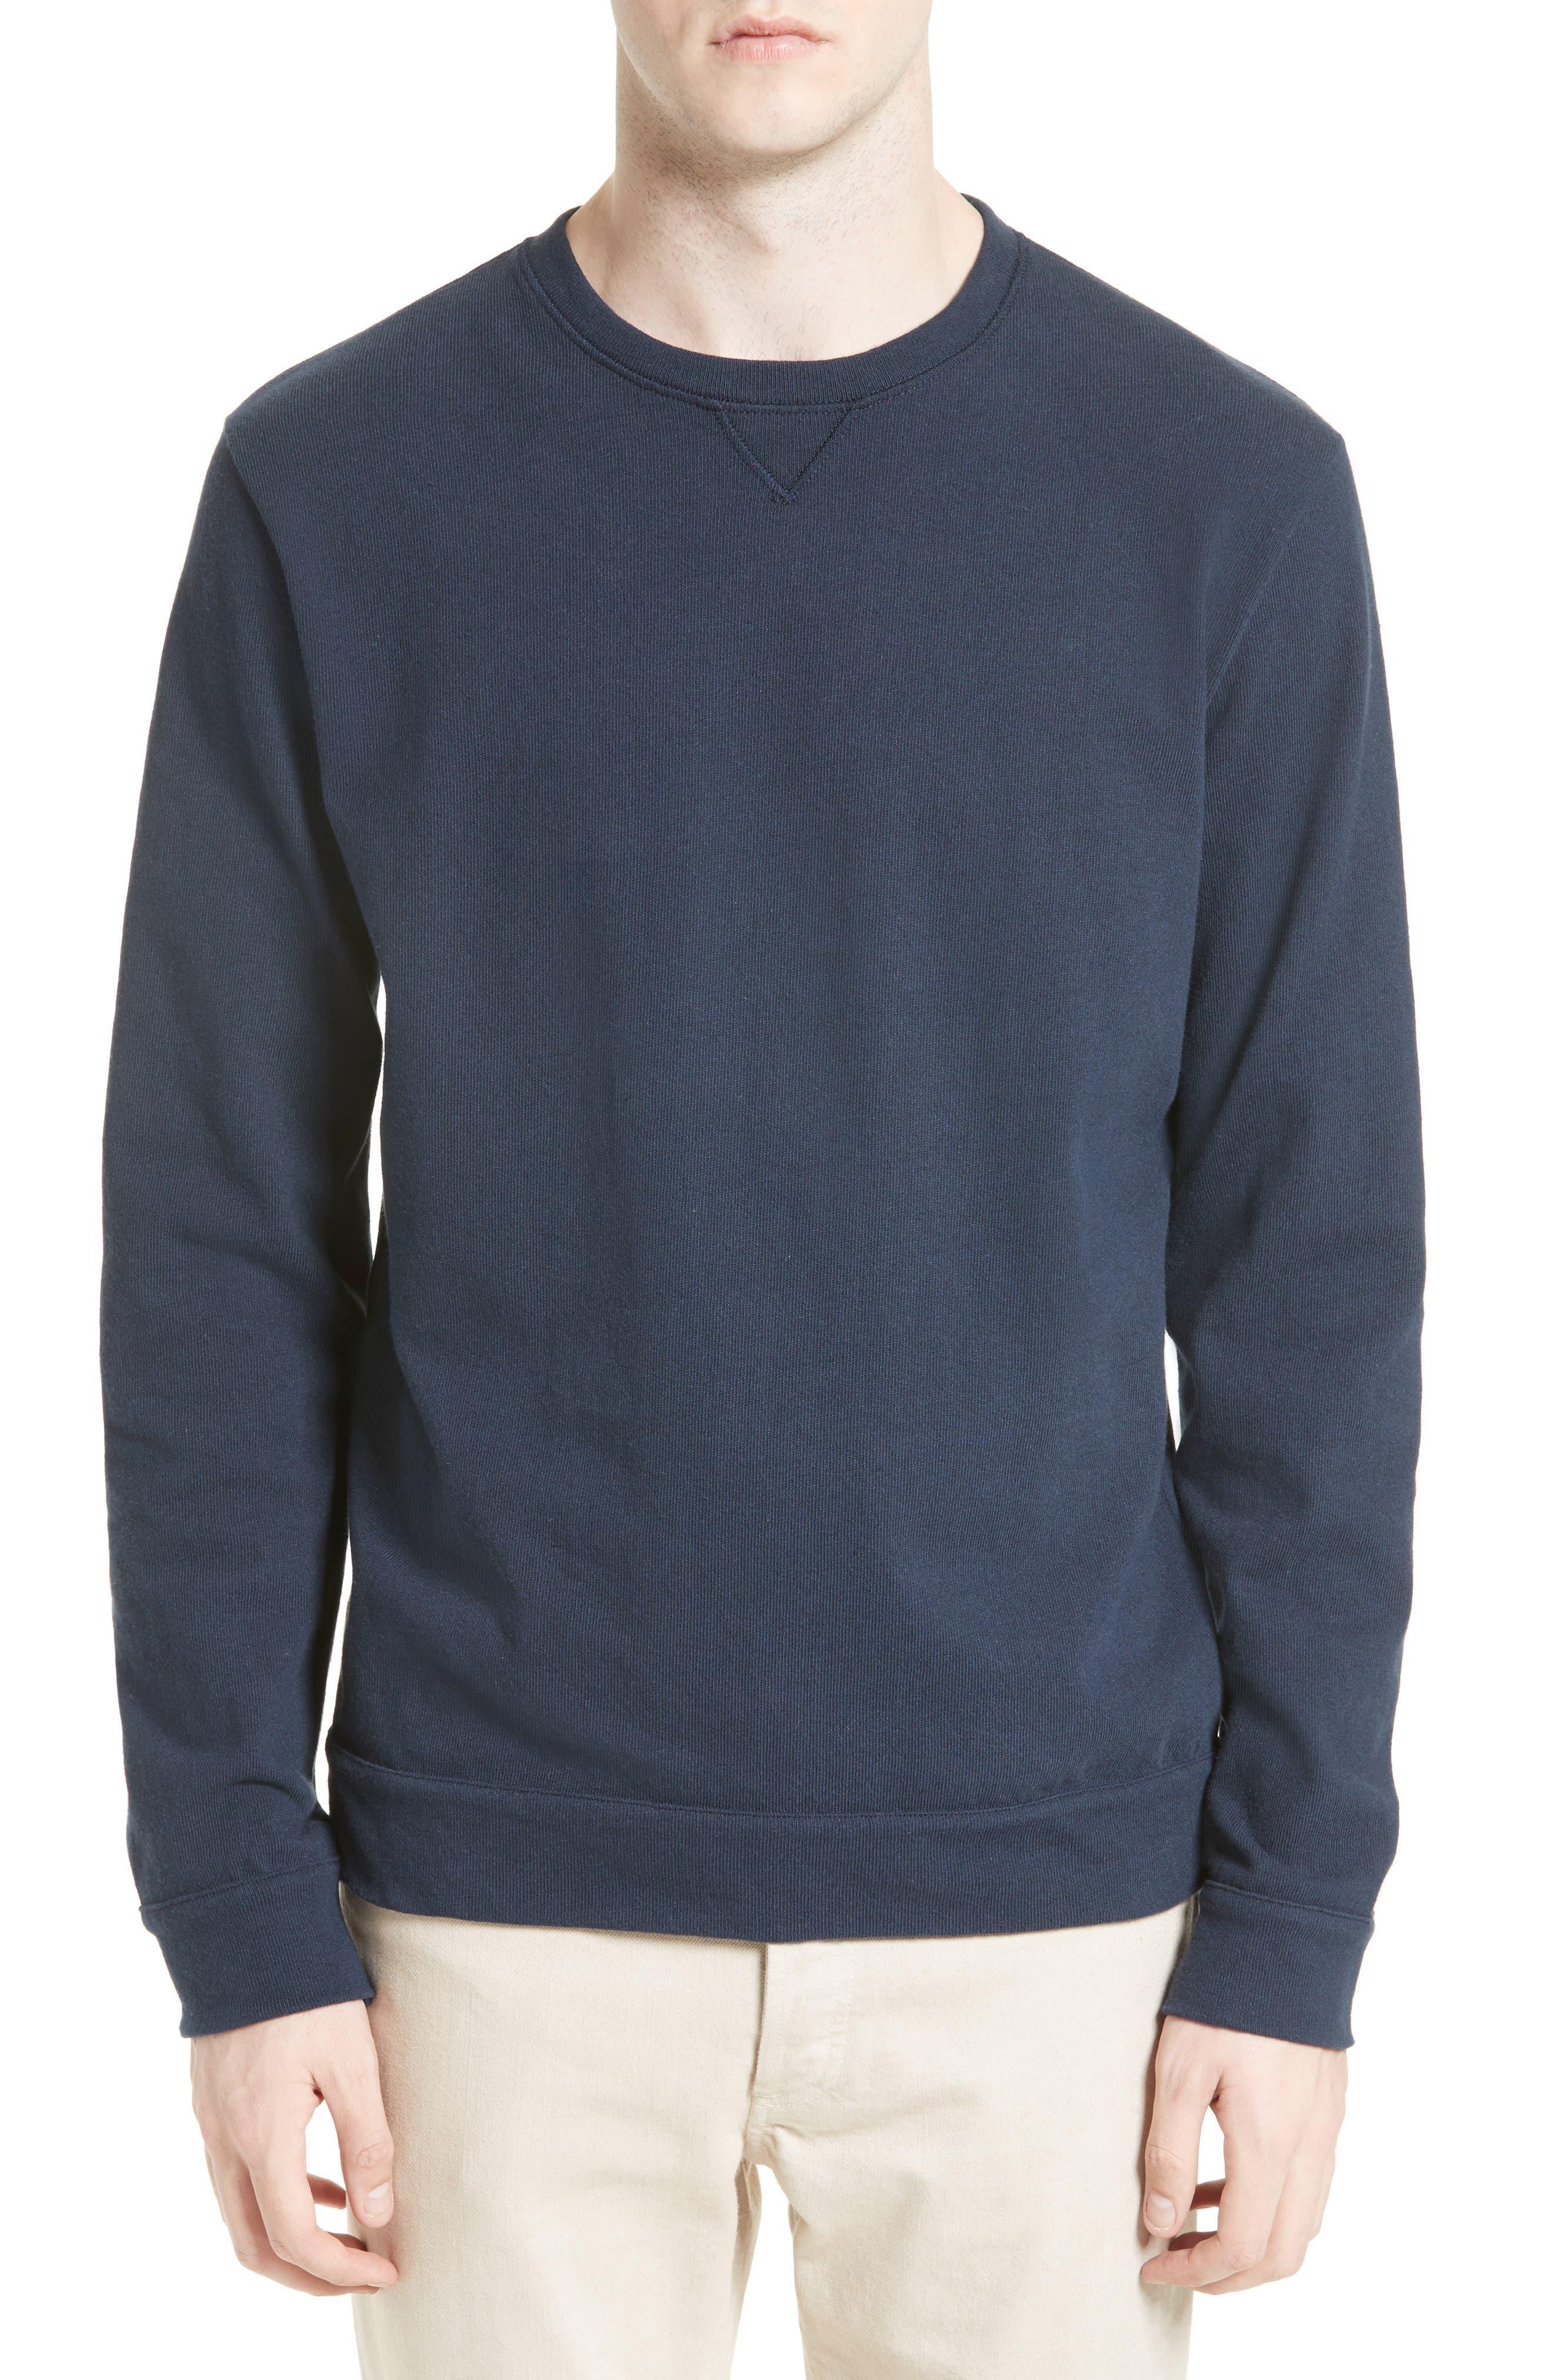 Hike Sweatshirt,                         Main,                         color, 410